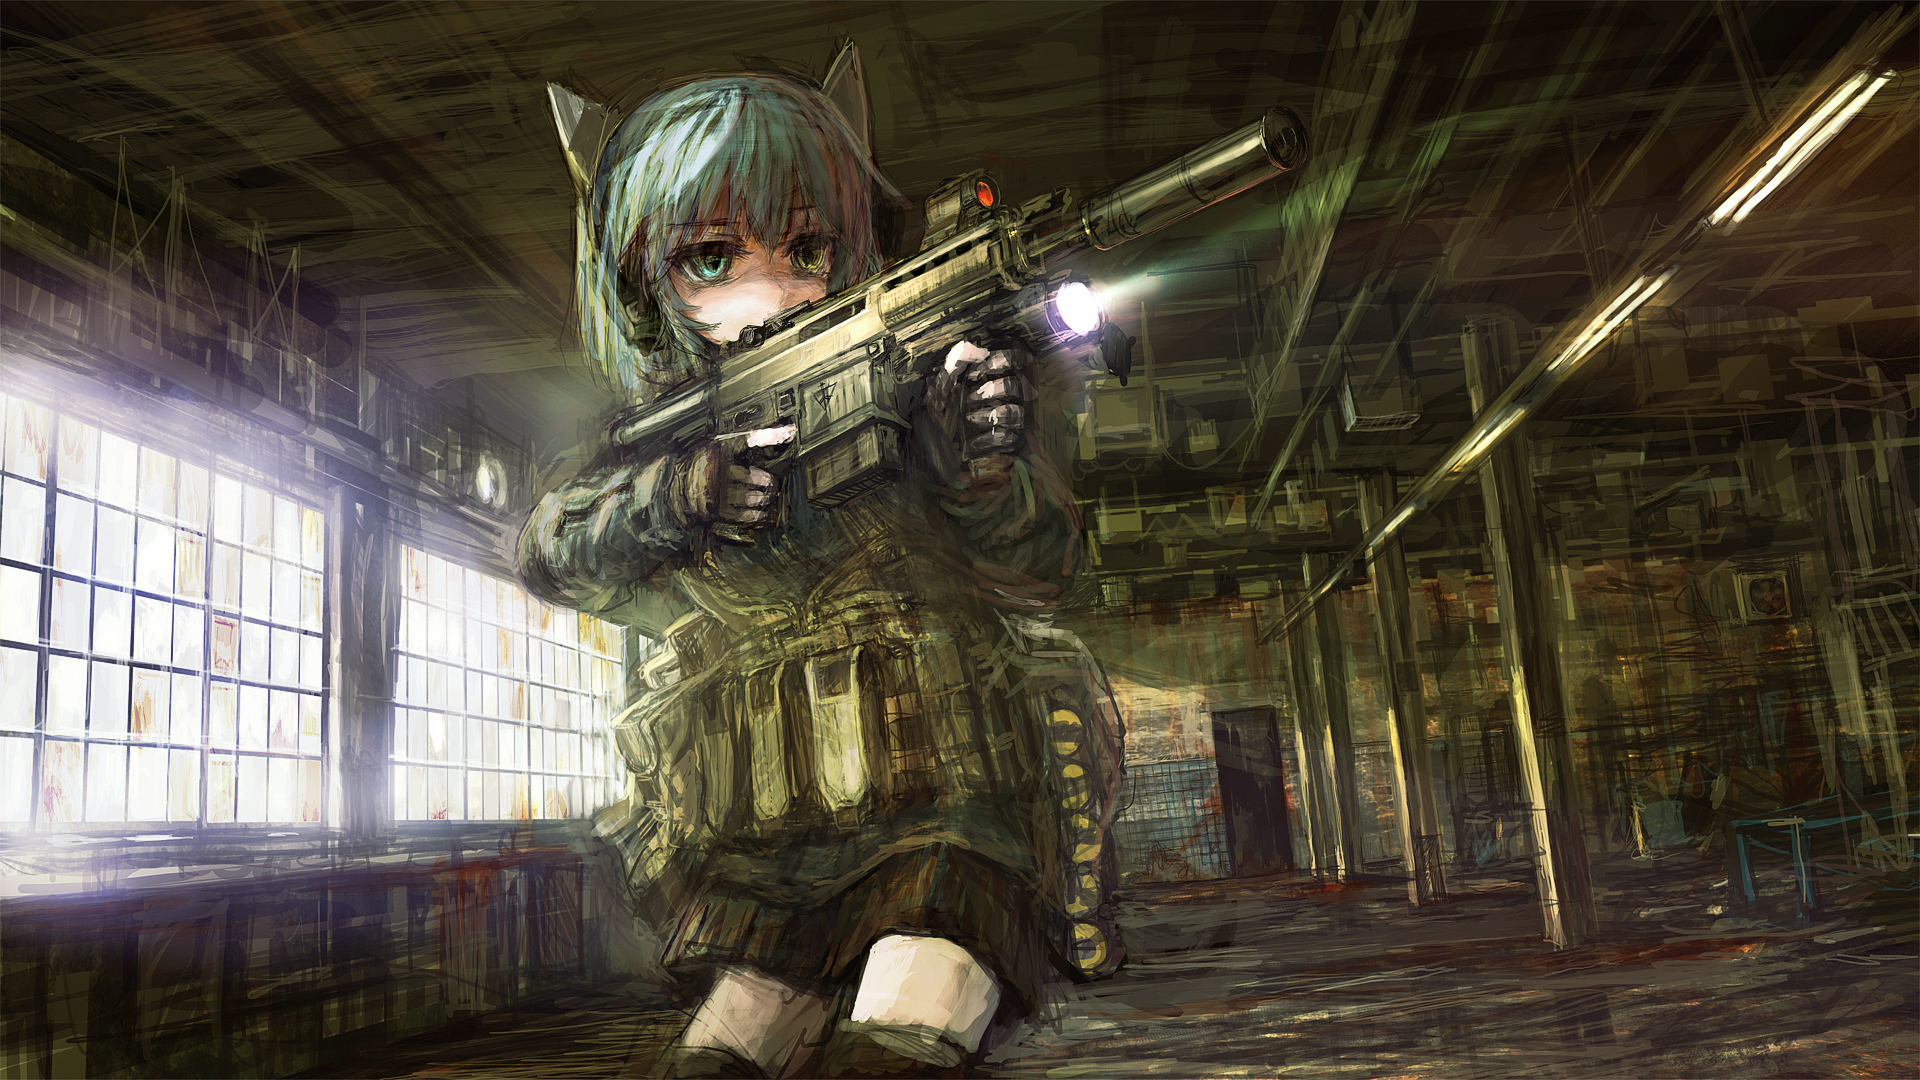 Pin On Anime Girls With Guns